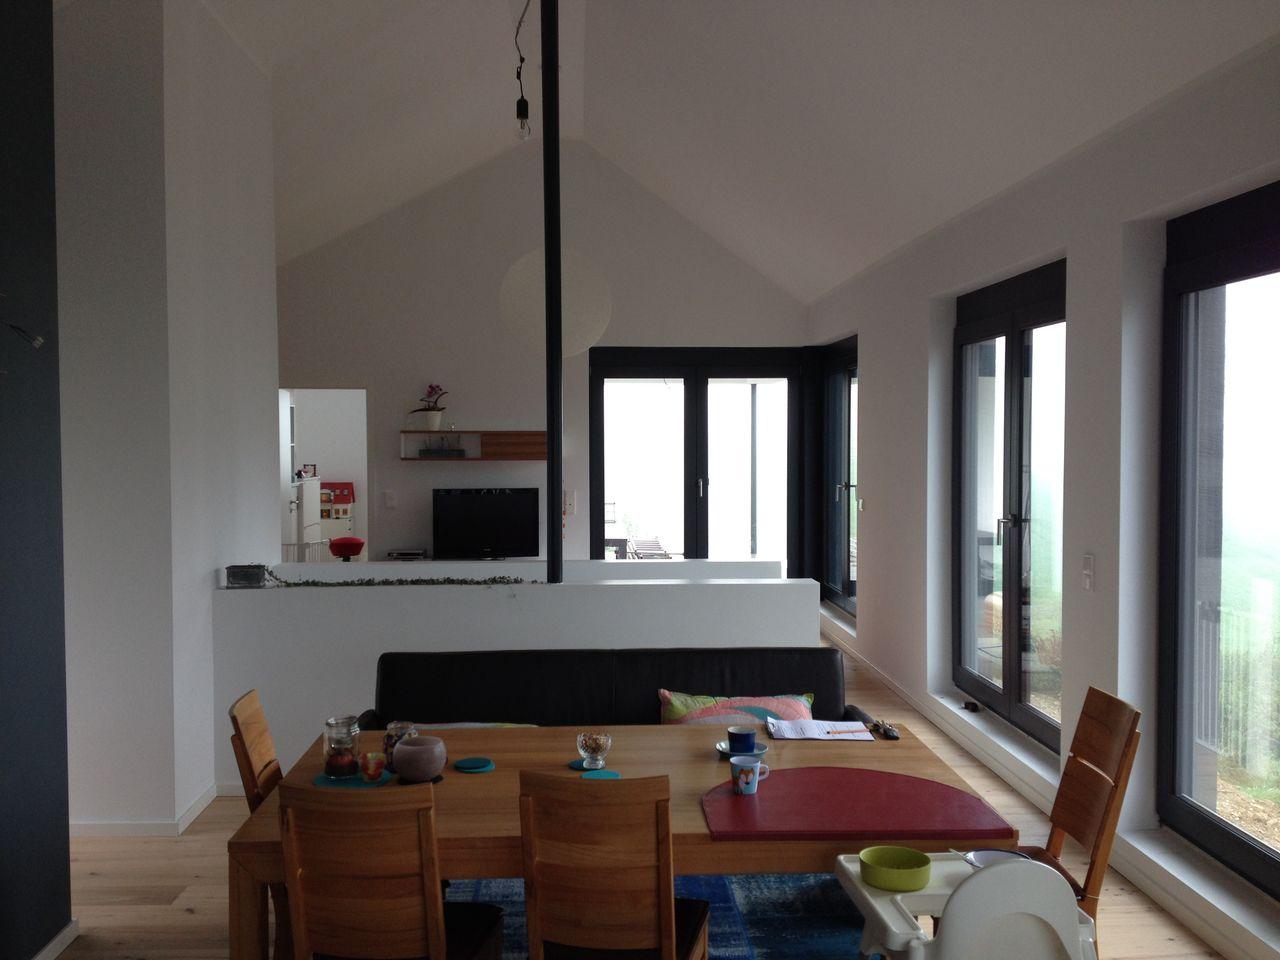 Architektenkammer Rheinland-Pfalz: detail